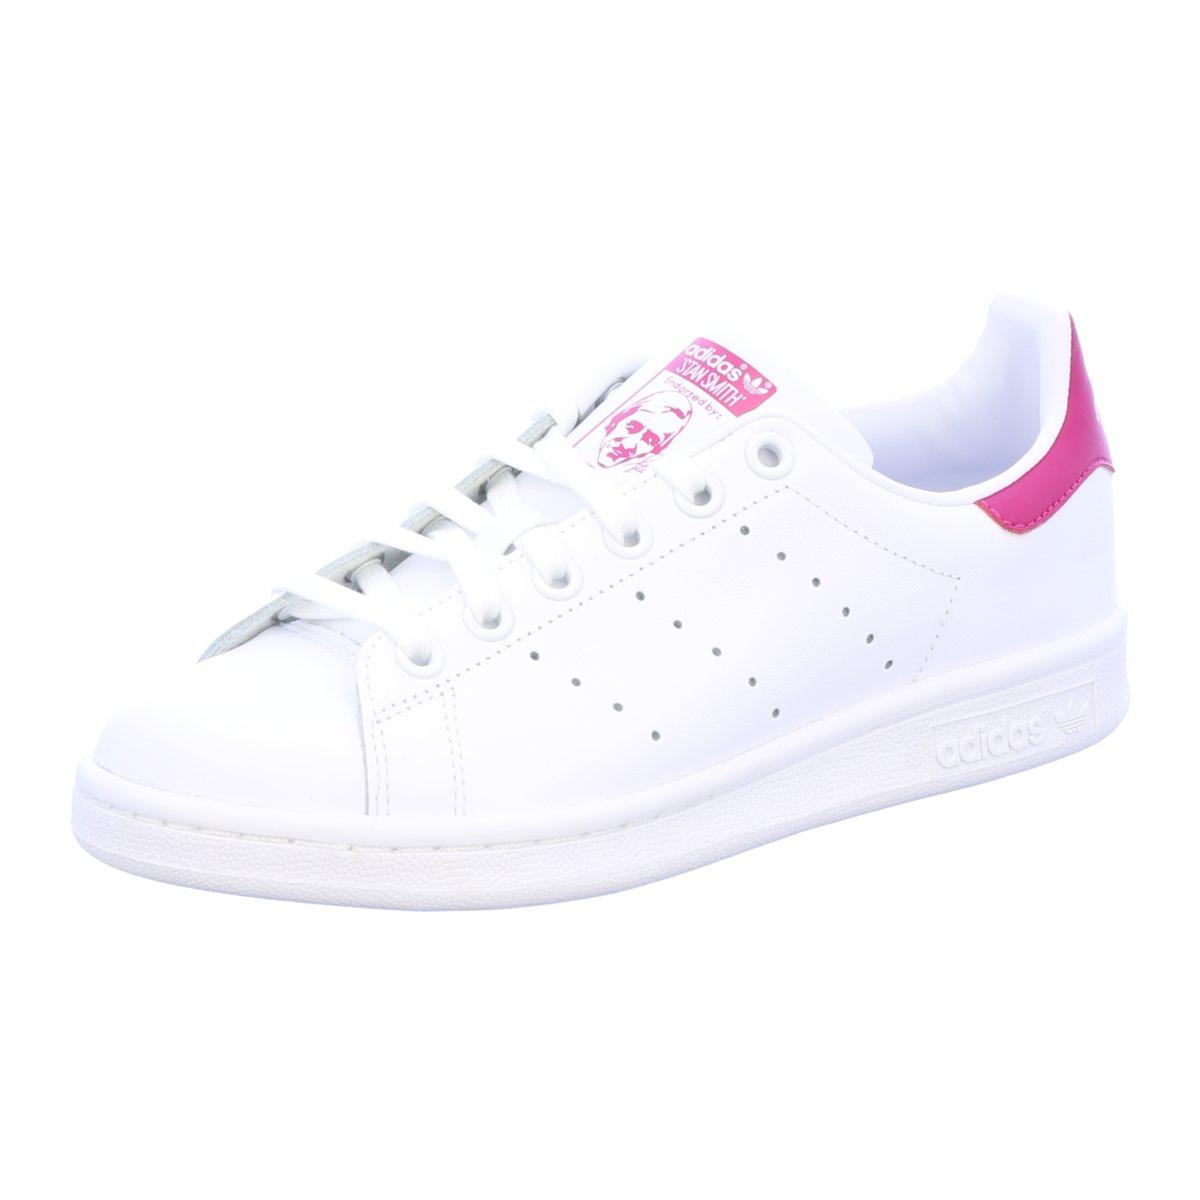 #S2K adidas Damen Sneaker Stan Smith Kinder Sneaker weiß pink B32703 weiß |  eBay